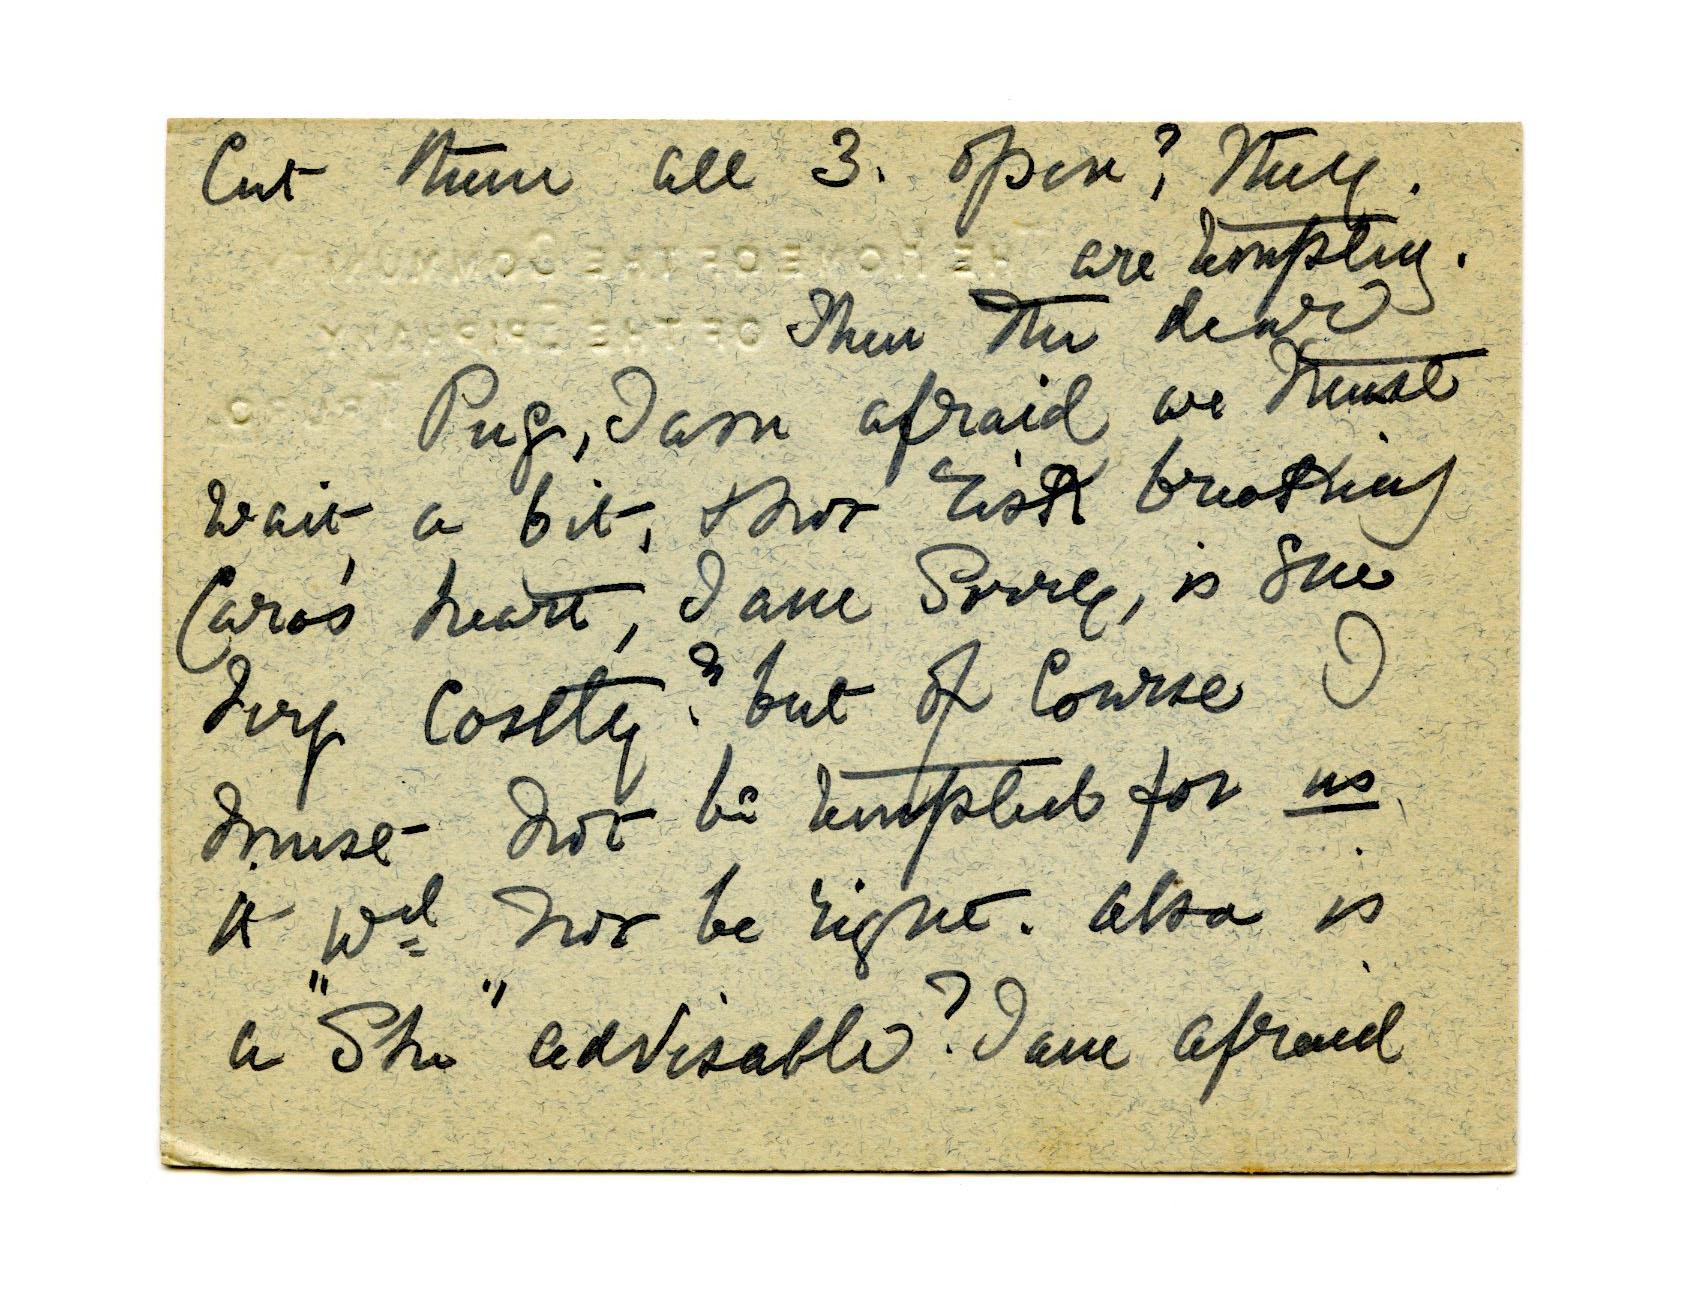 Old letter regarding Mother Julian